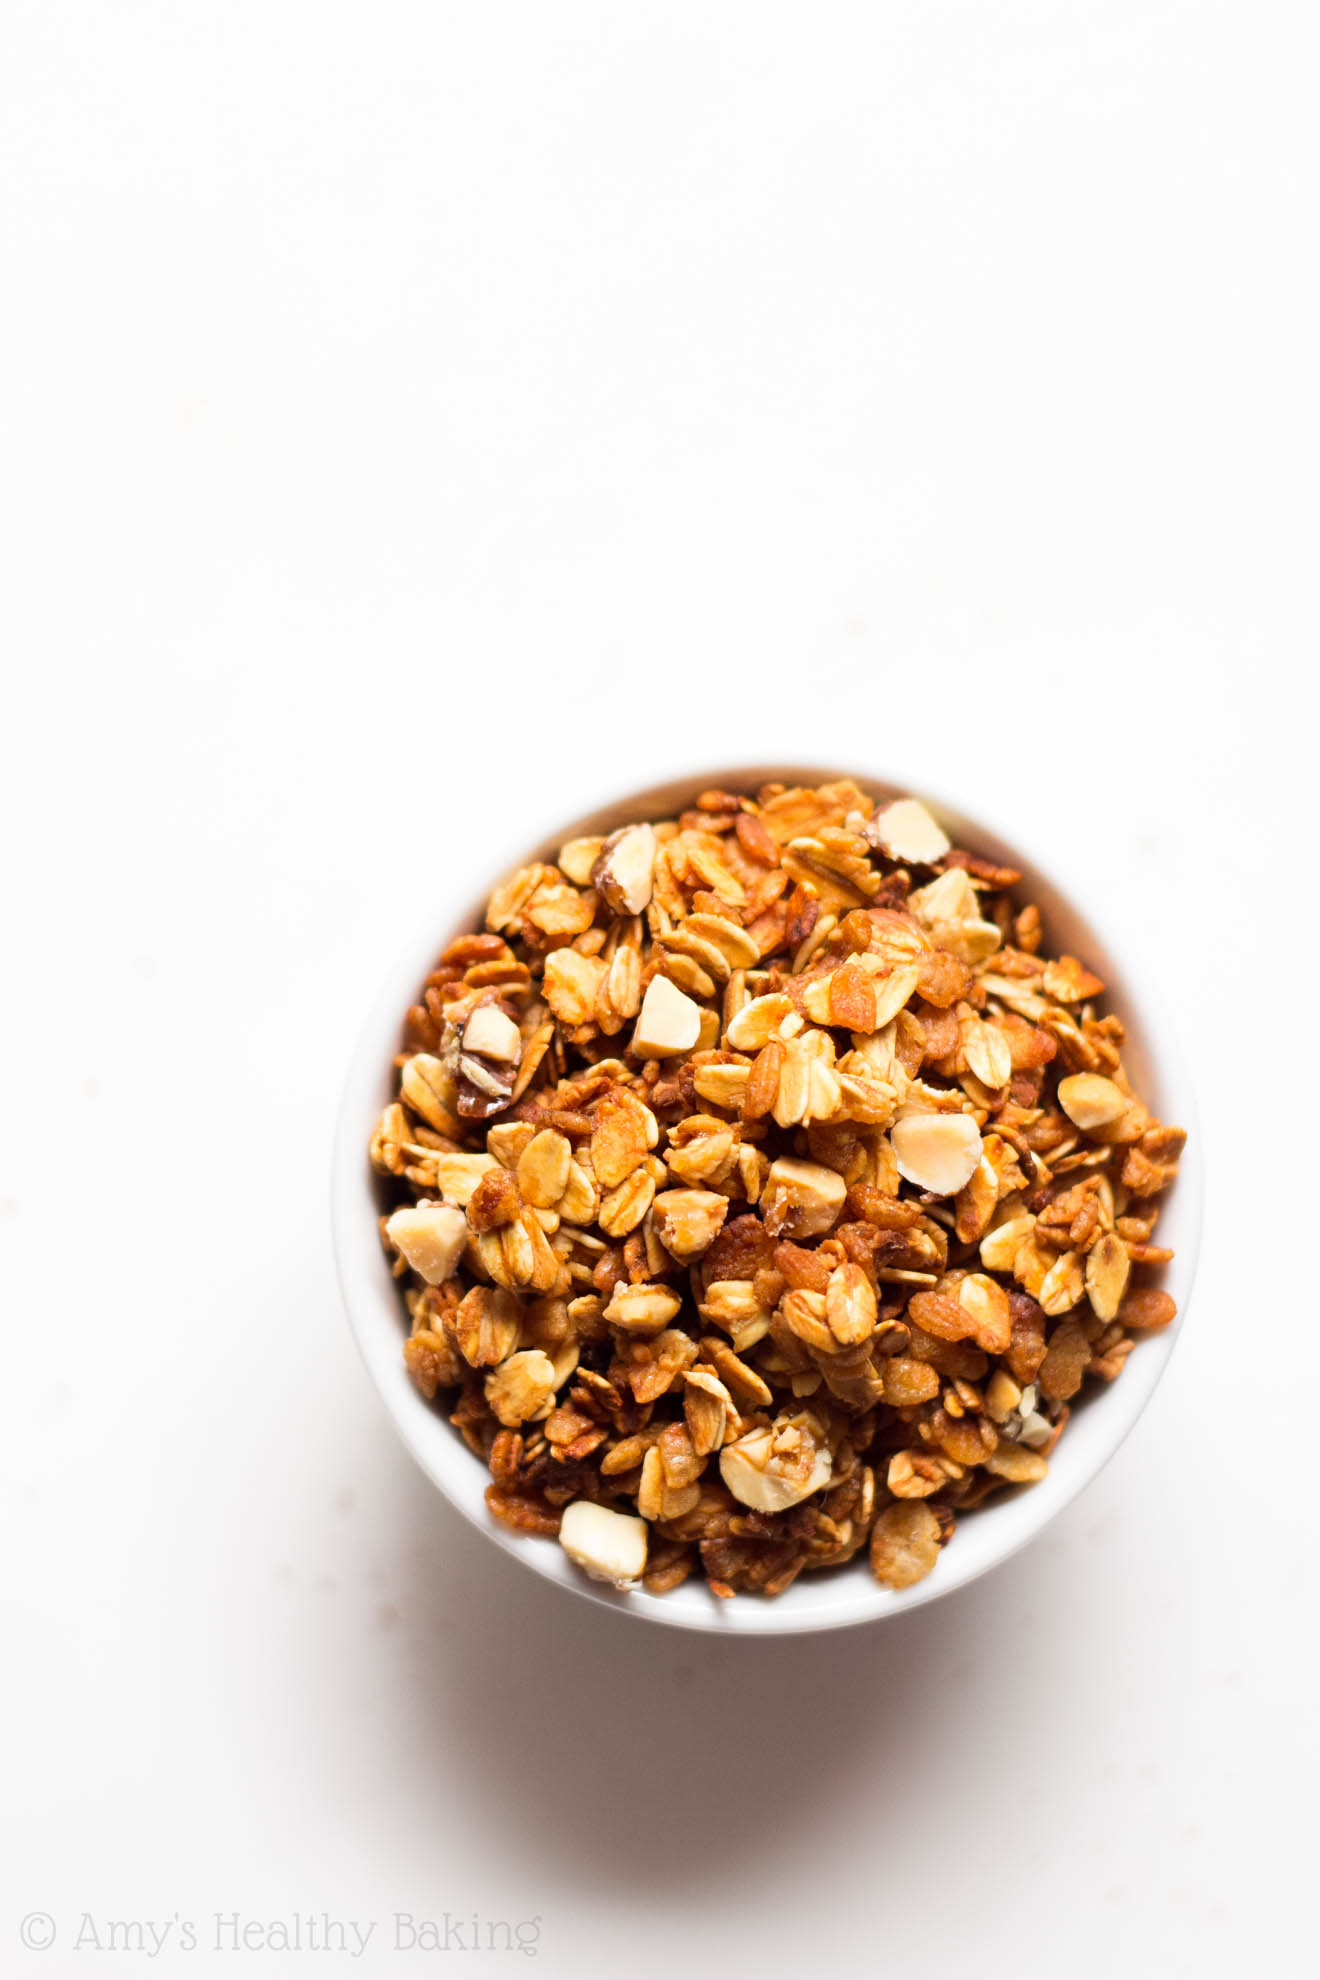 Top 10 Gluten-Free Snacks